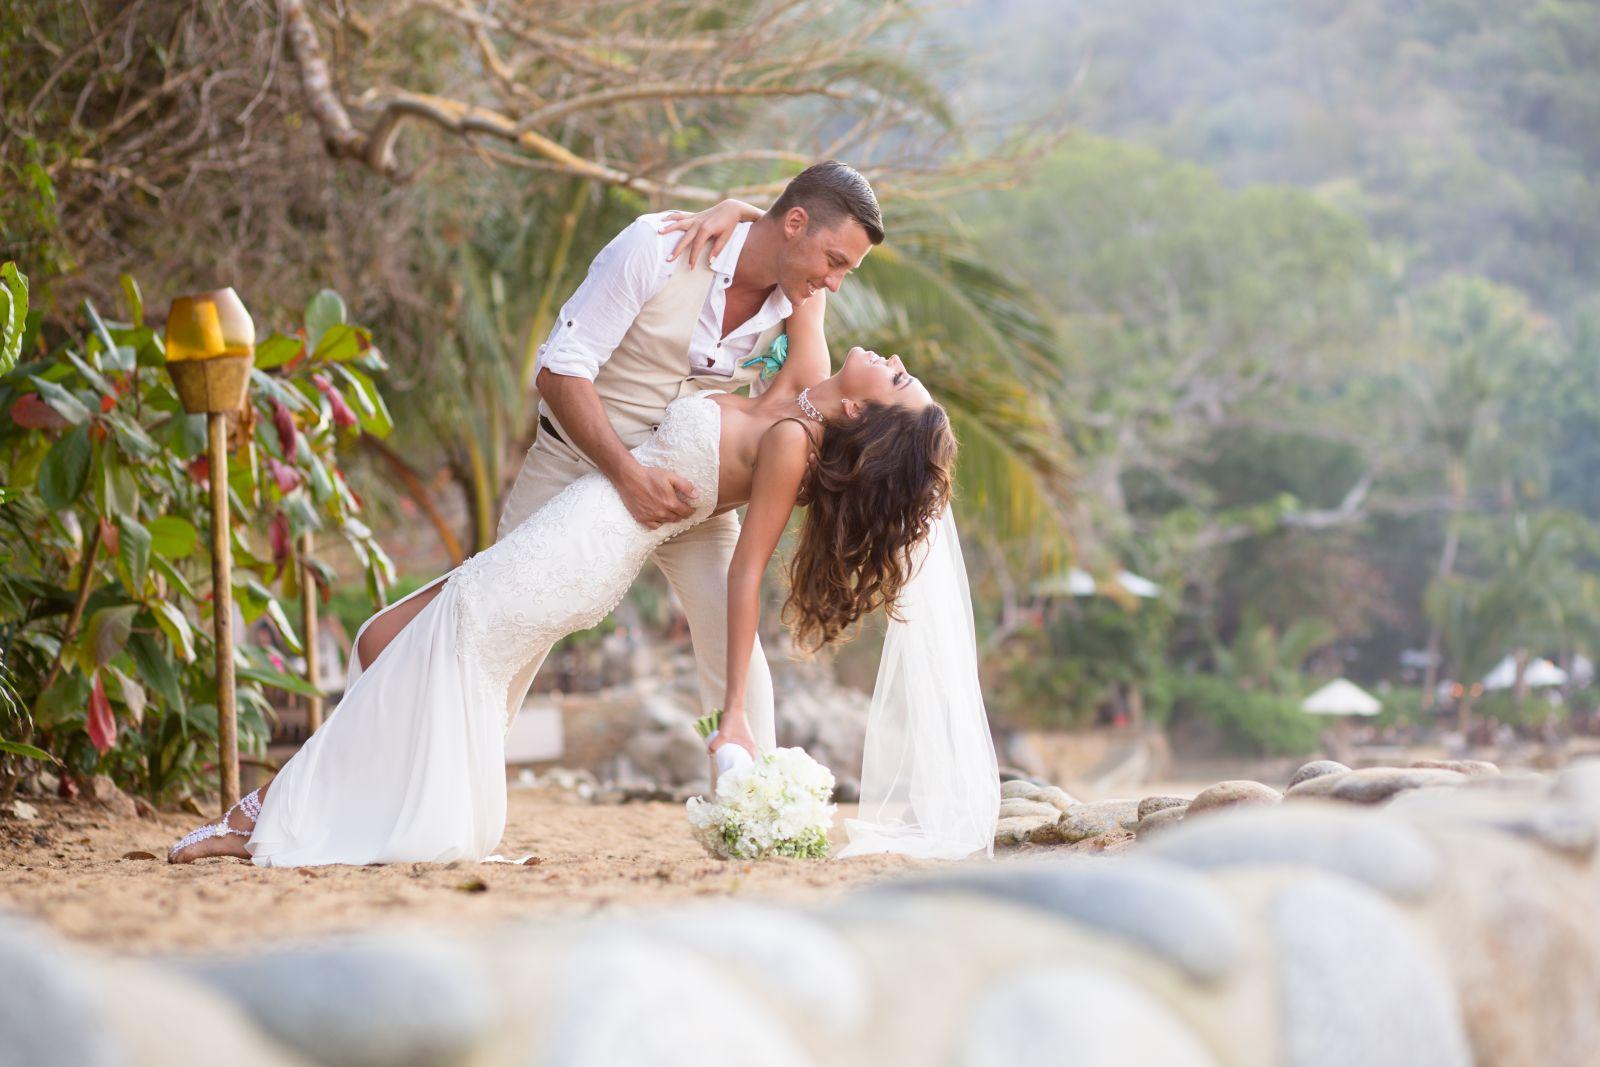 unforgettable experiences of love- Adventure weddings